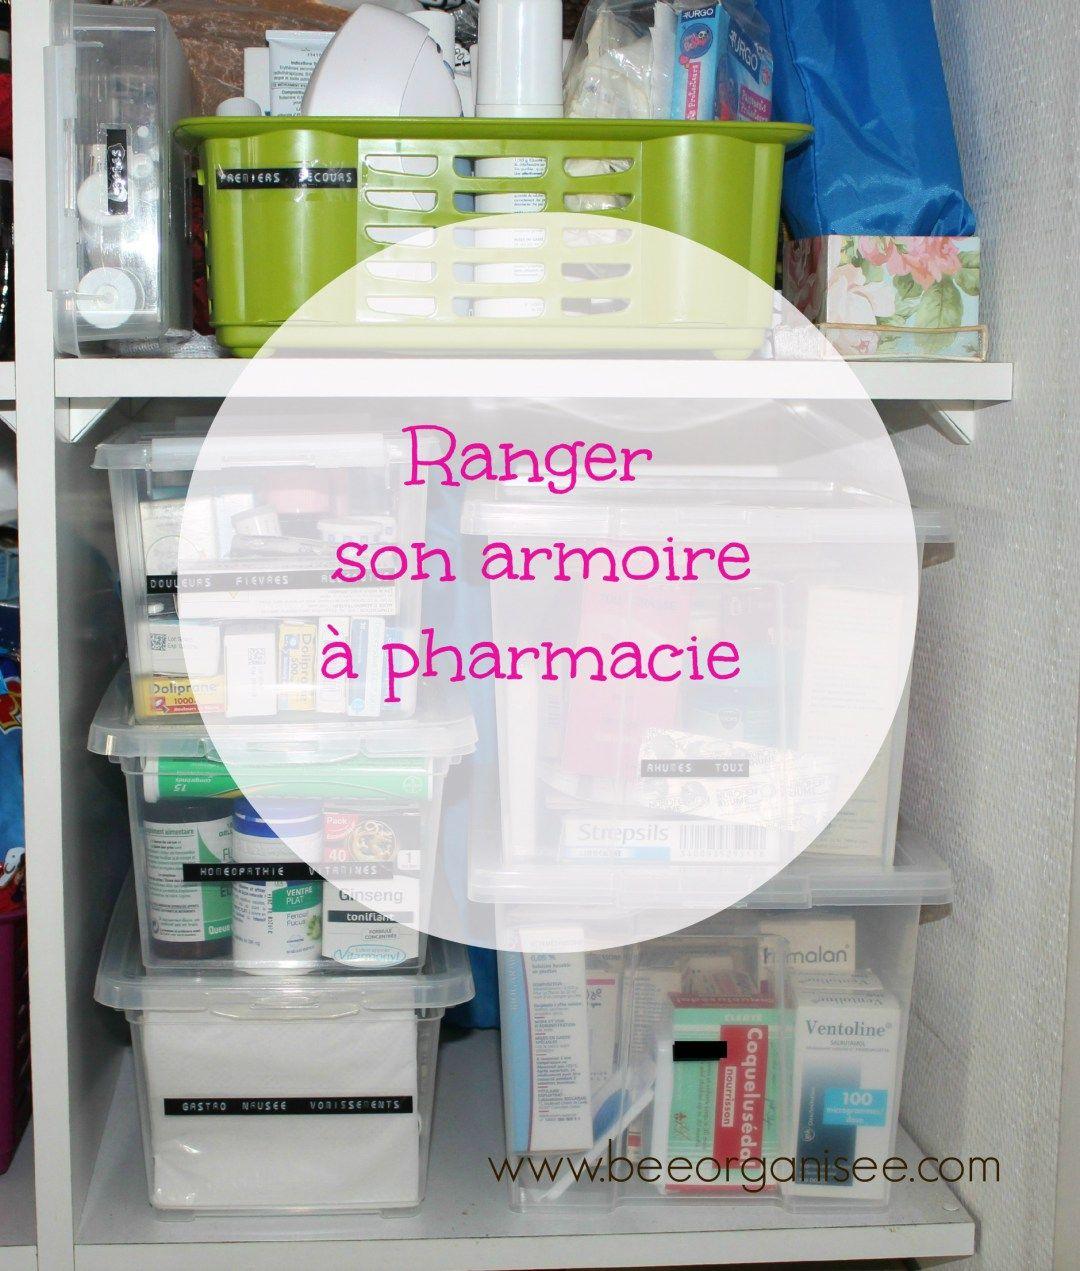 Ranger Son Armoire A Pharmacie Bee Organisee Armoire A Pharmacie Rangement Medicaments Rangement